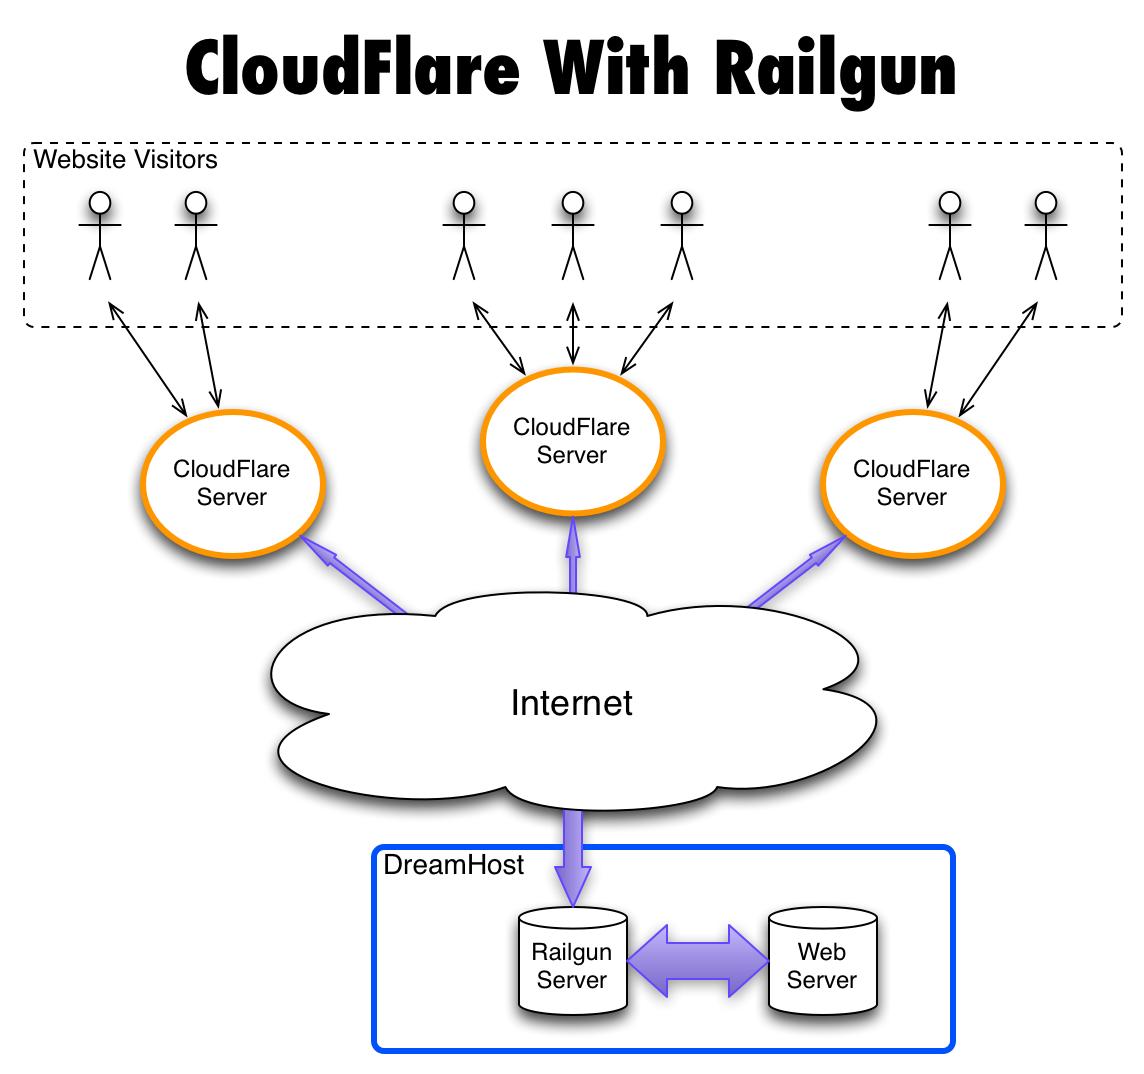 CloudFlare With Railgun